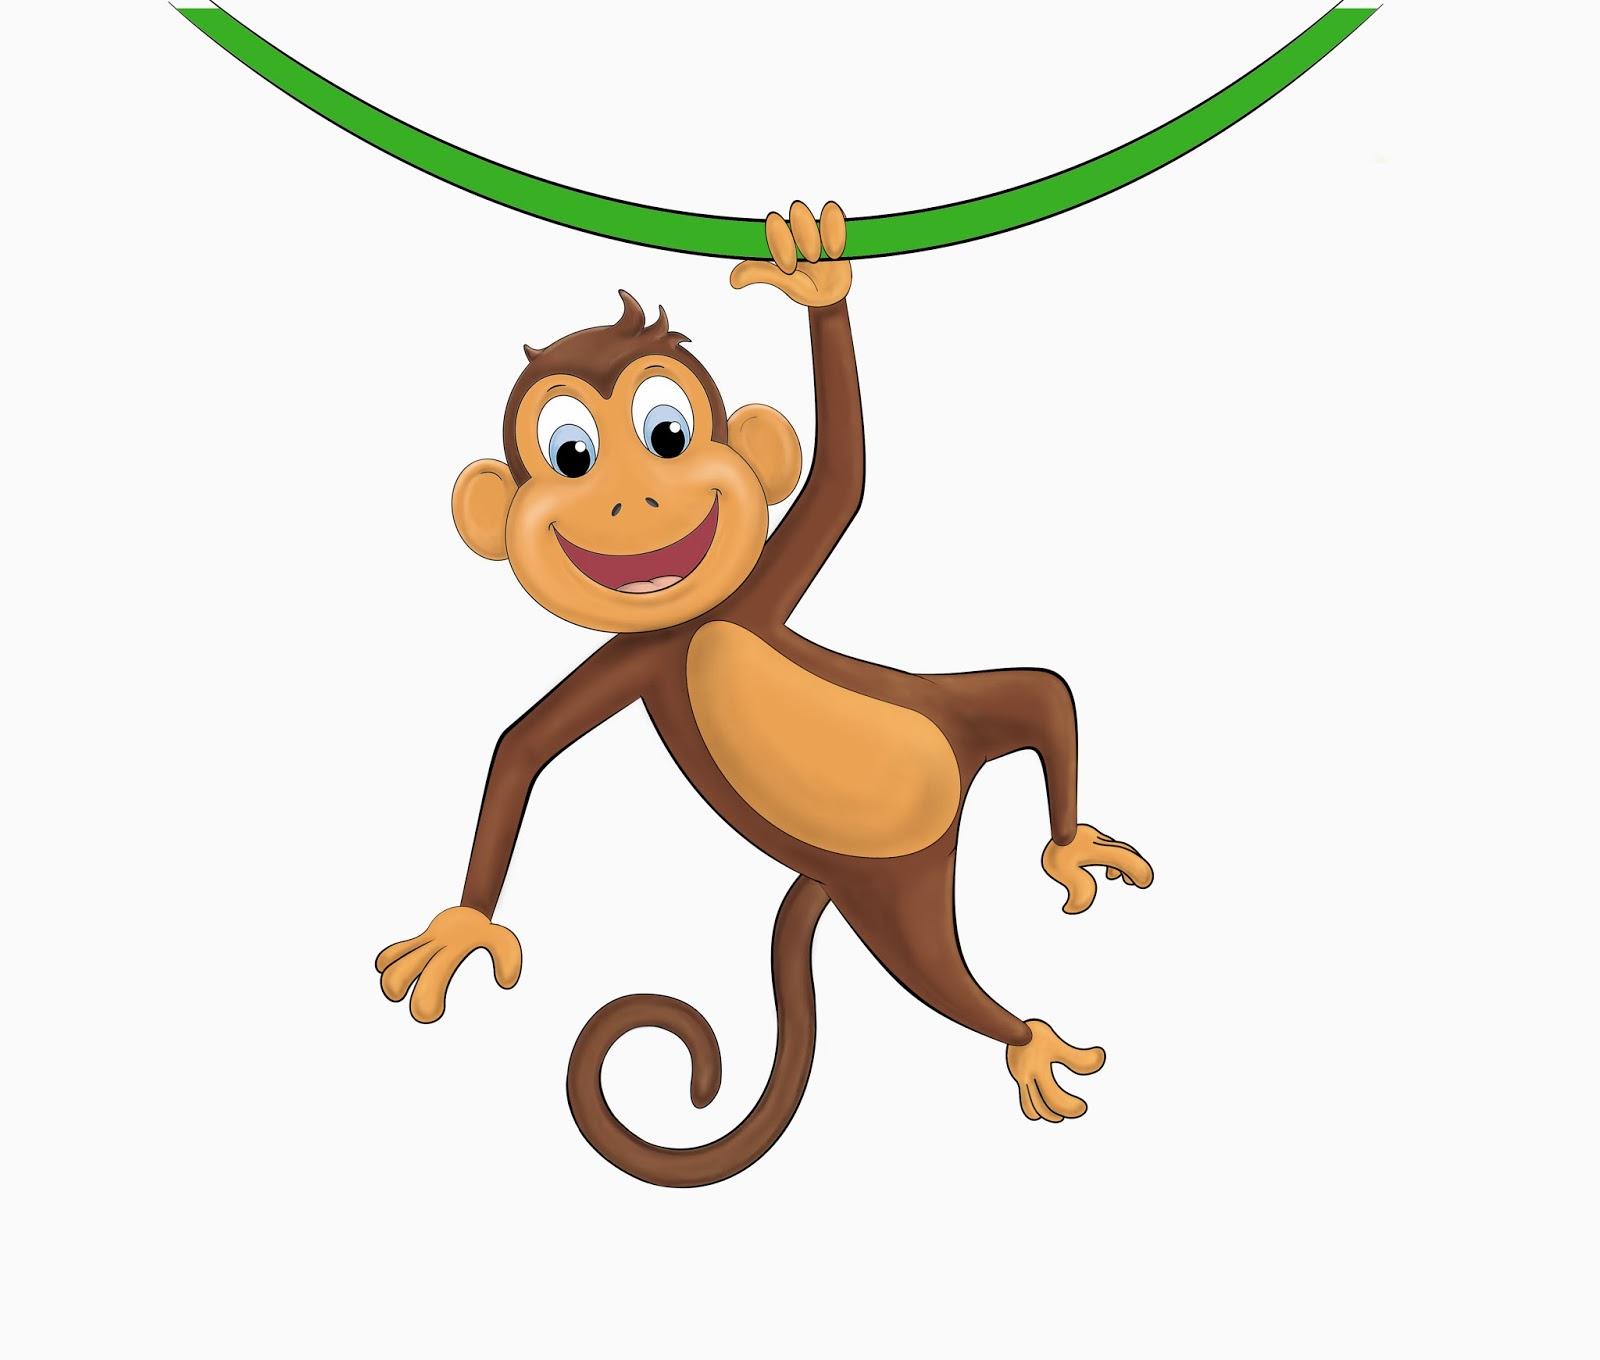 Free ape clipart clipart free Monkey Clip Art For Teachers | Clipart Panda - Free Clipart Images clipart free